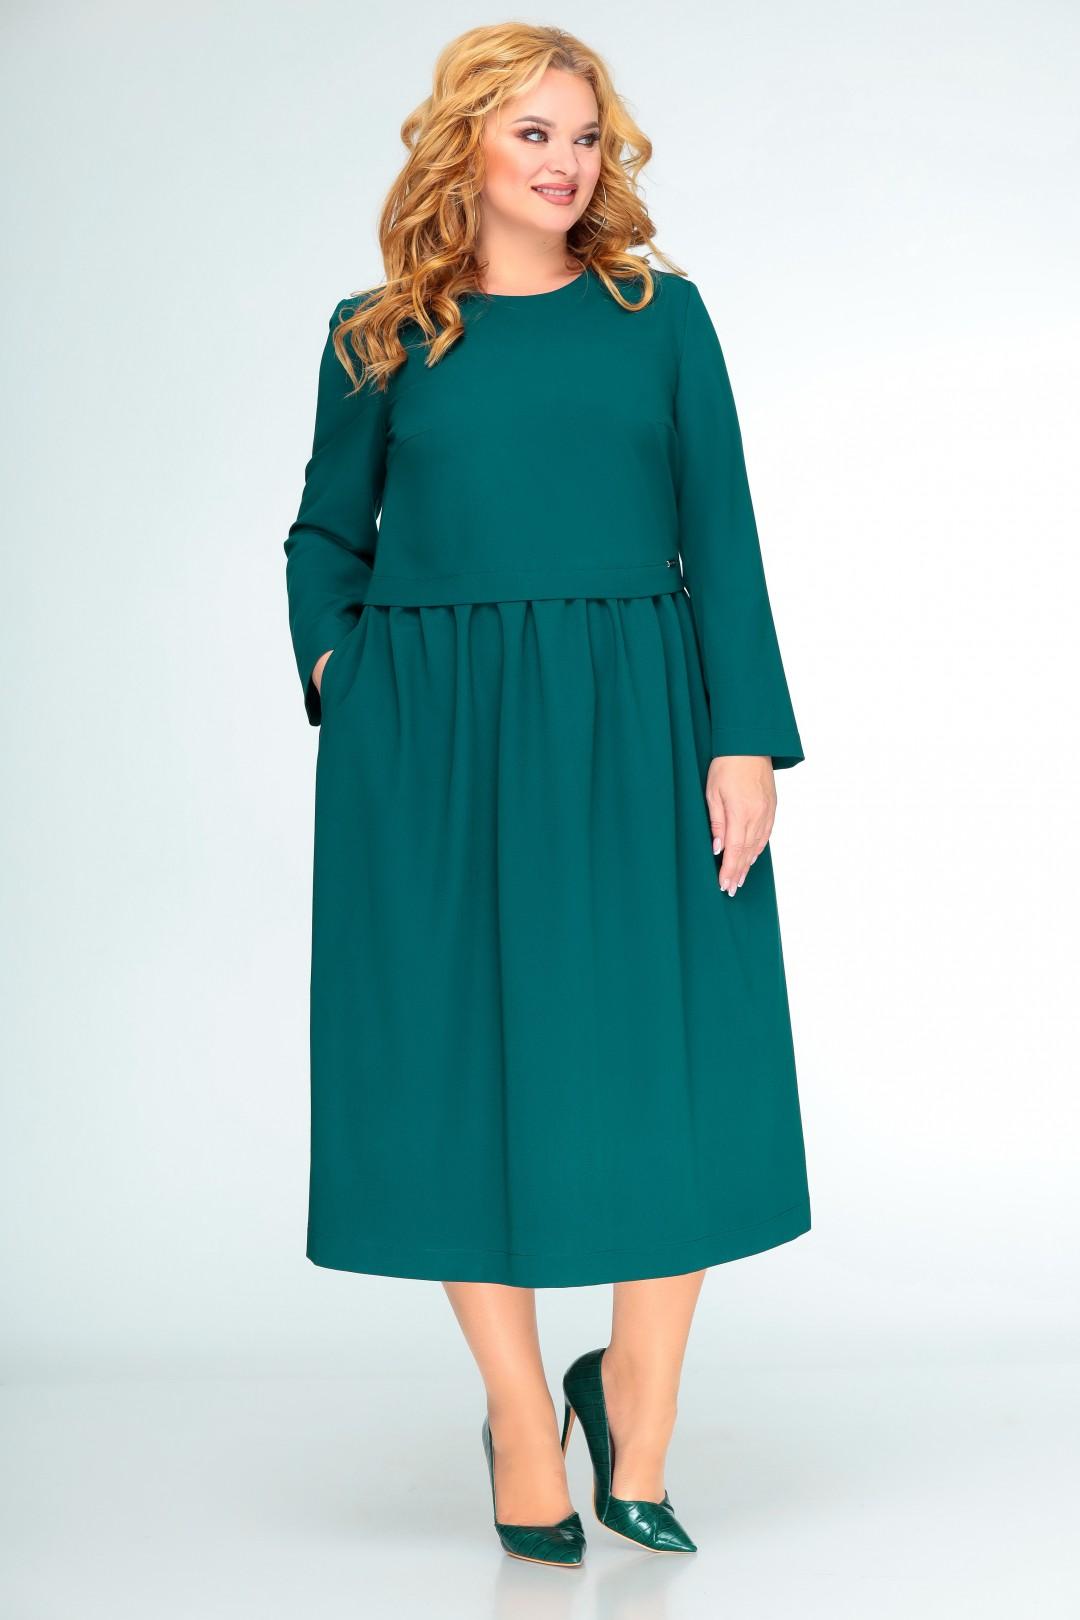 Платье Swallow 407 зеленый «бутылка»